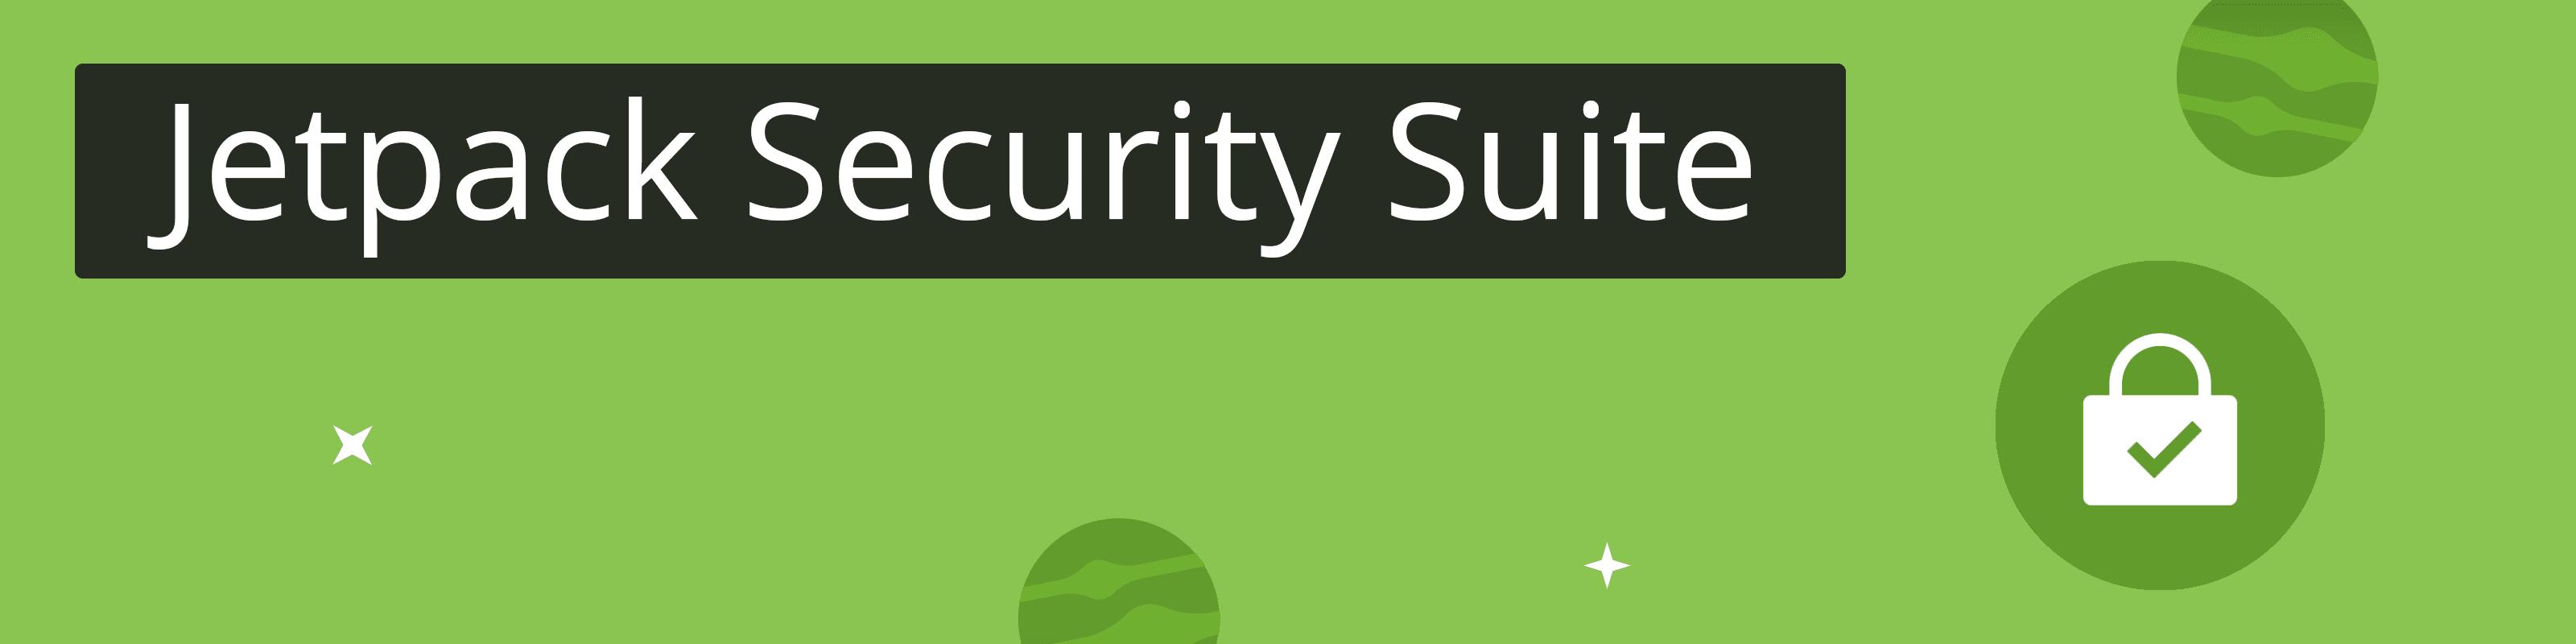 JetPack Security Suite